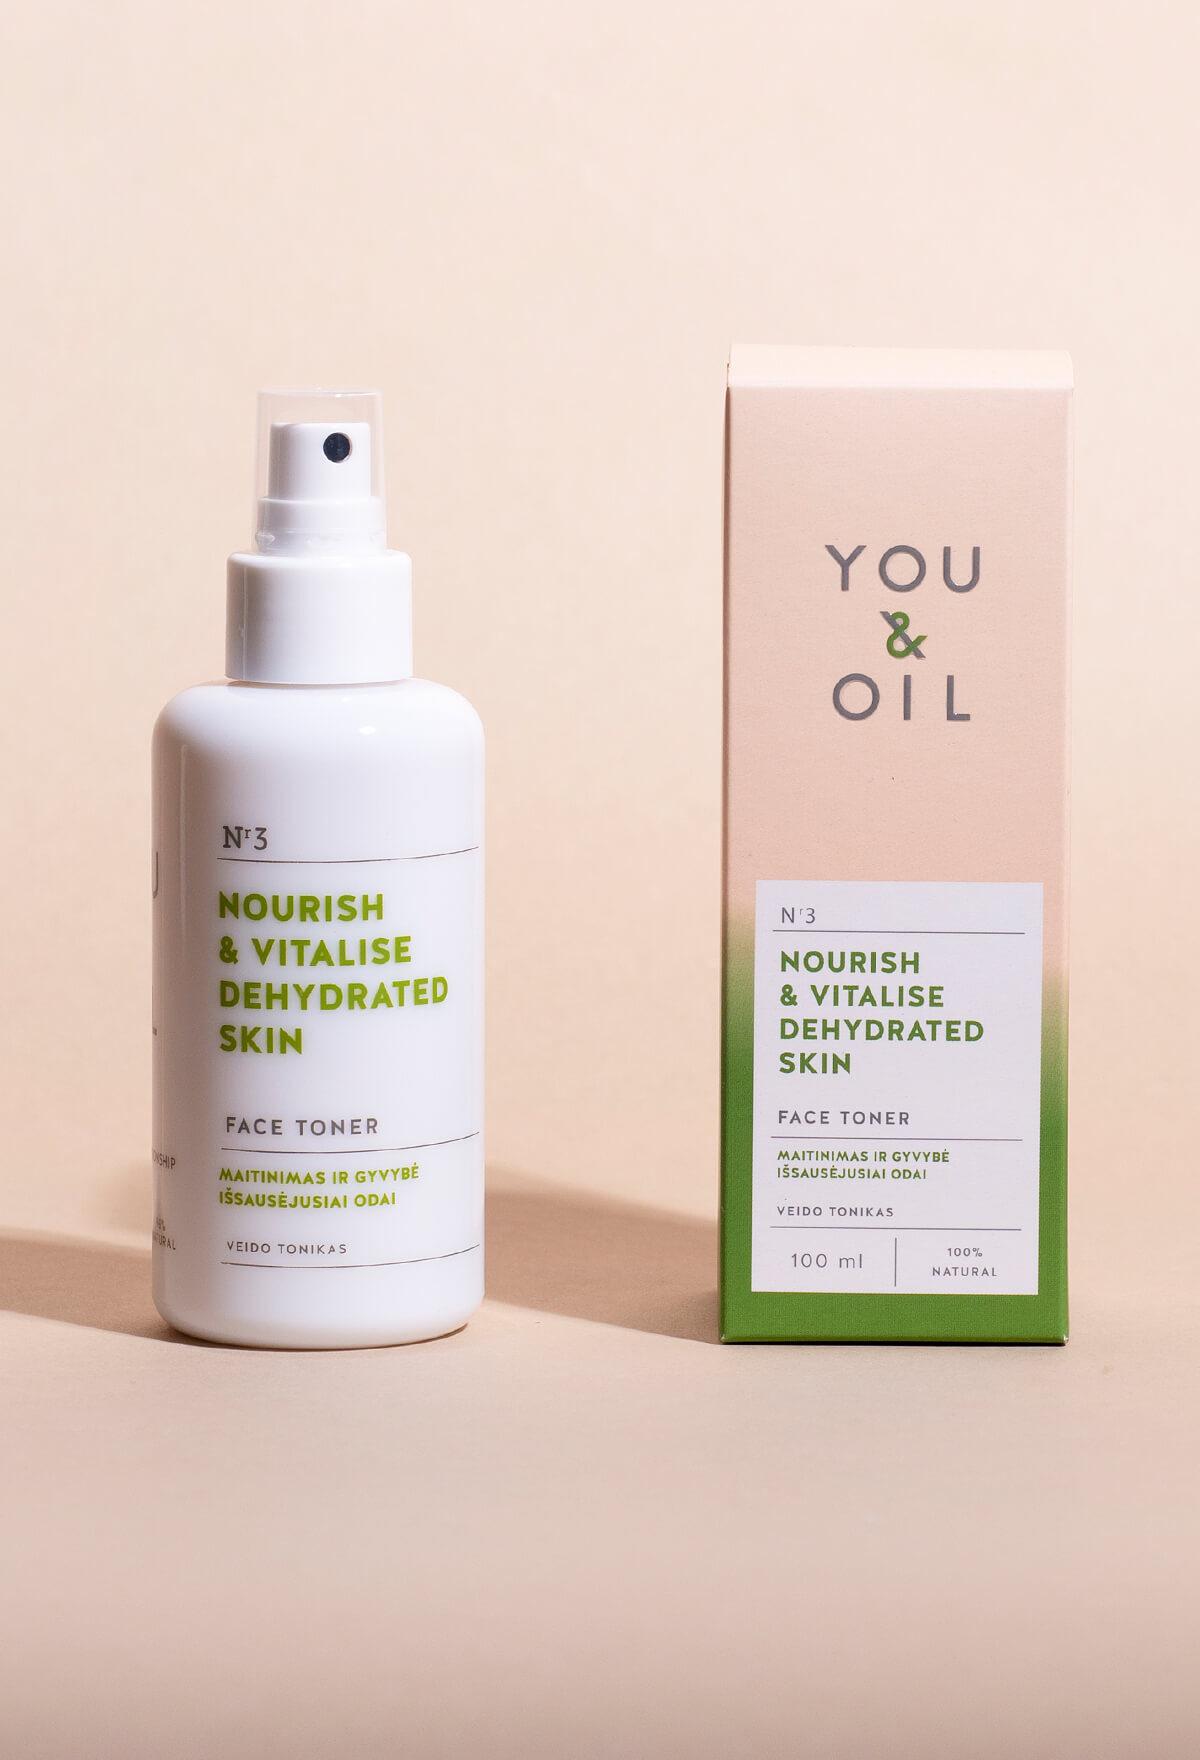 1293Nourish & Vitalise Dehydrated Skin